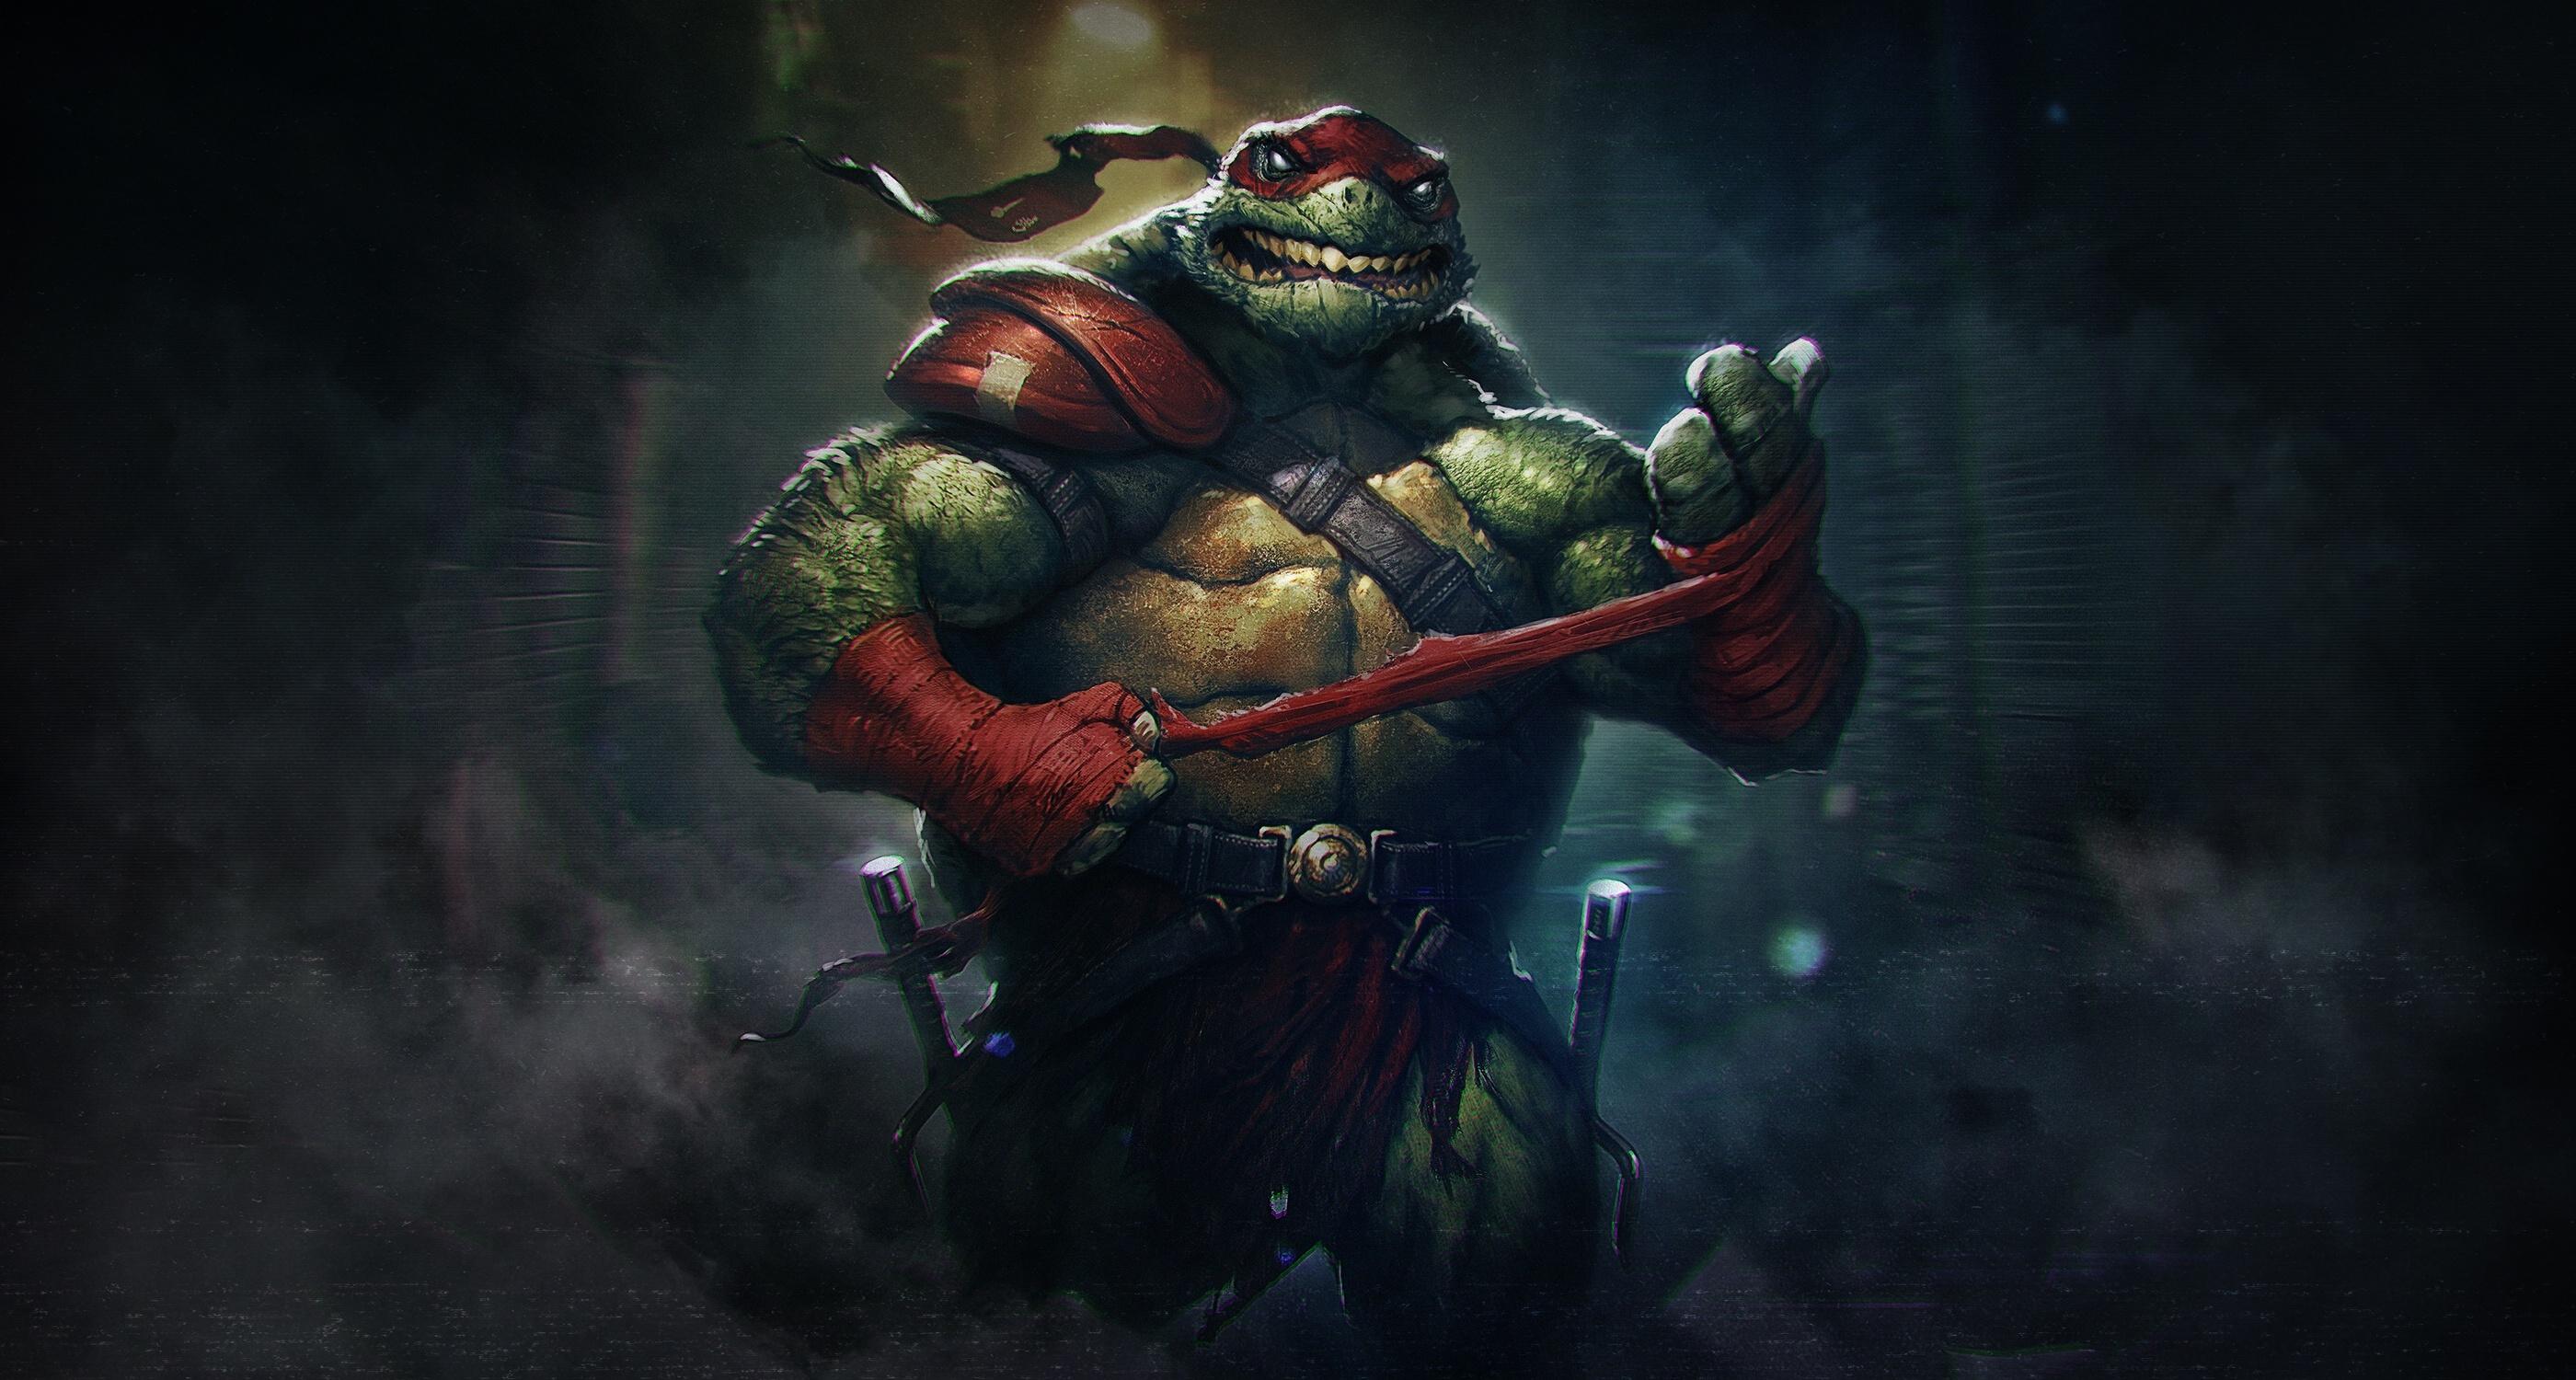 Wallpaper Alex Borsuk Teenage Mutant Ninja Turtles Fantasy Art